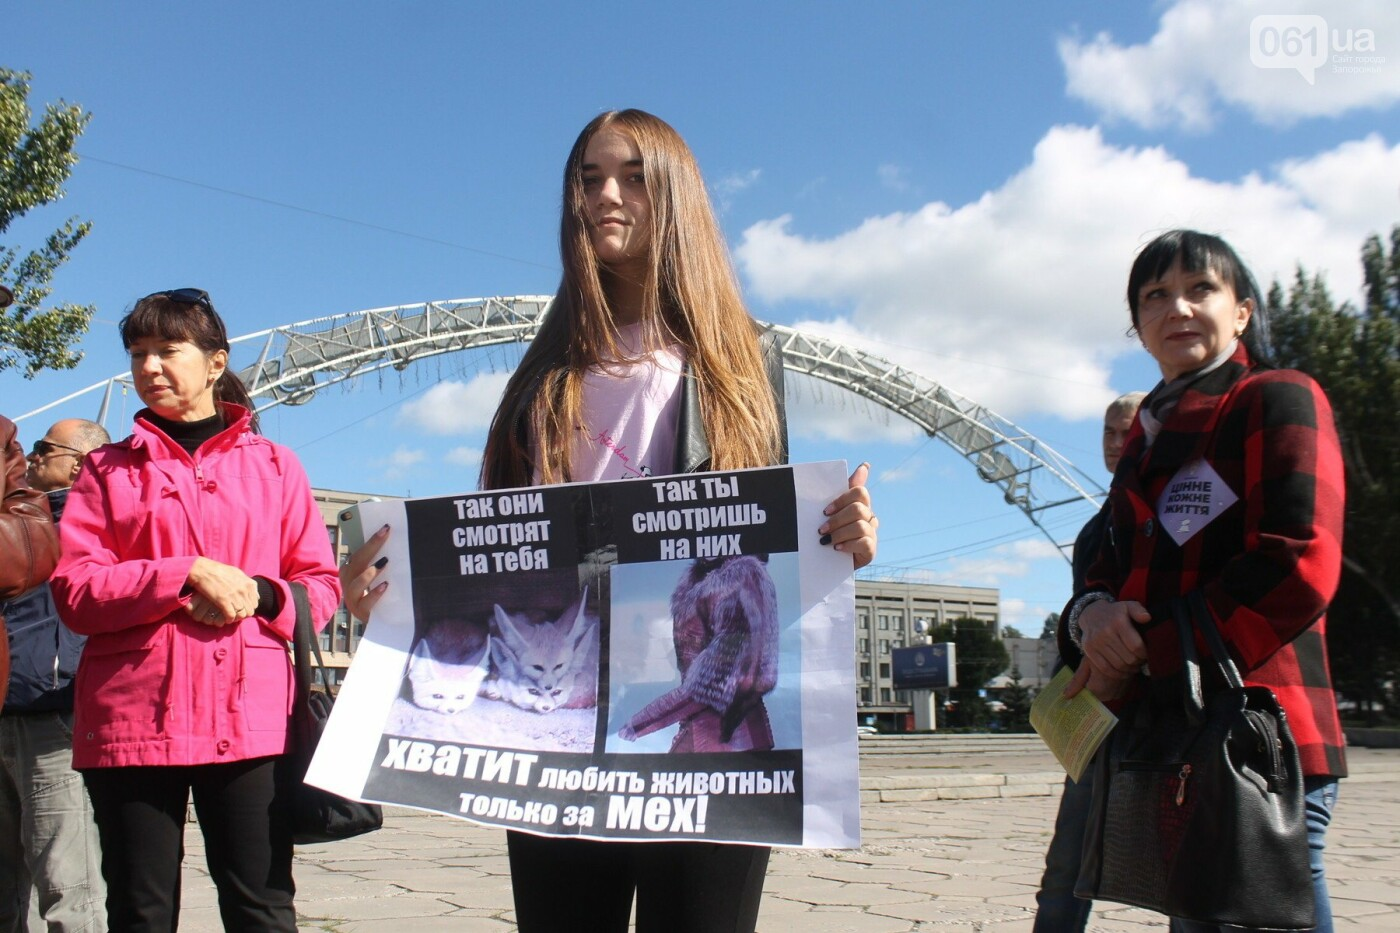 «Защити! Не мучай»: в Запорожье провели марш за права животных, – ФОТОРЕПОРТАЖ, ВИДЕО, фото-14